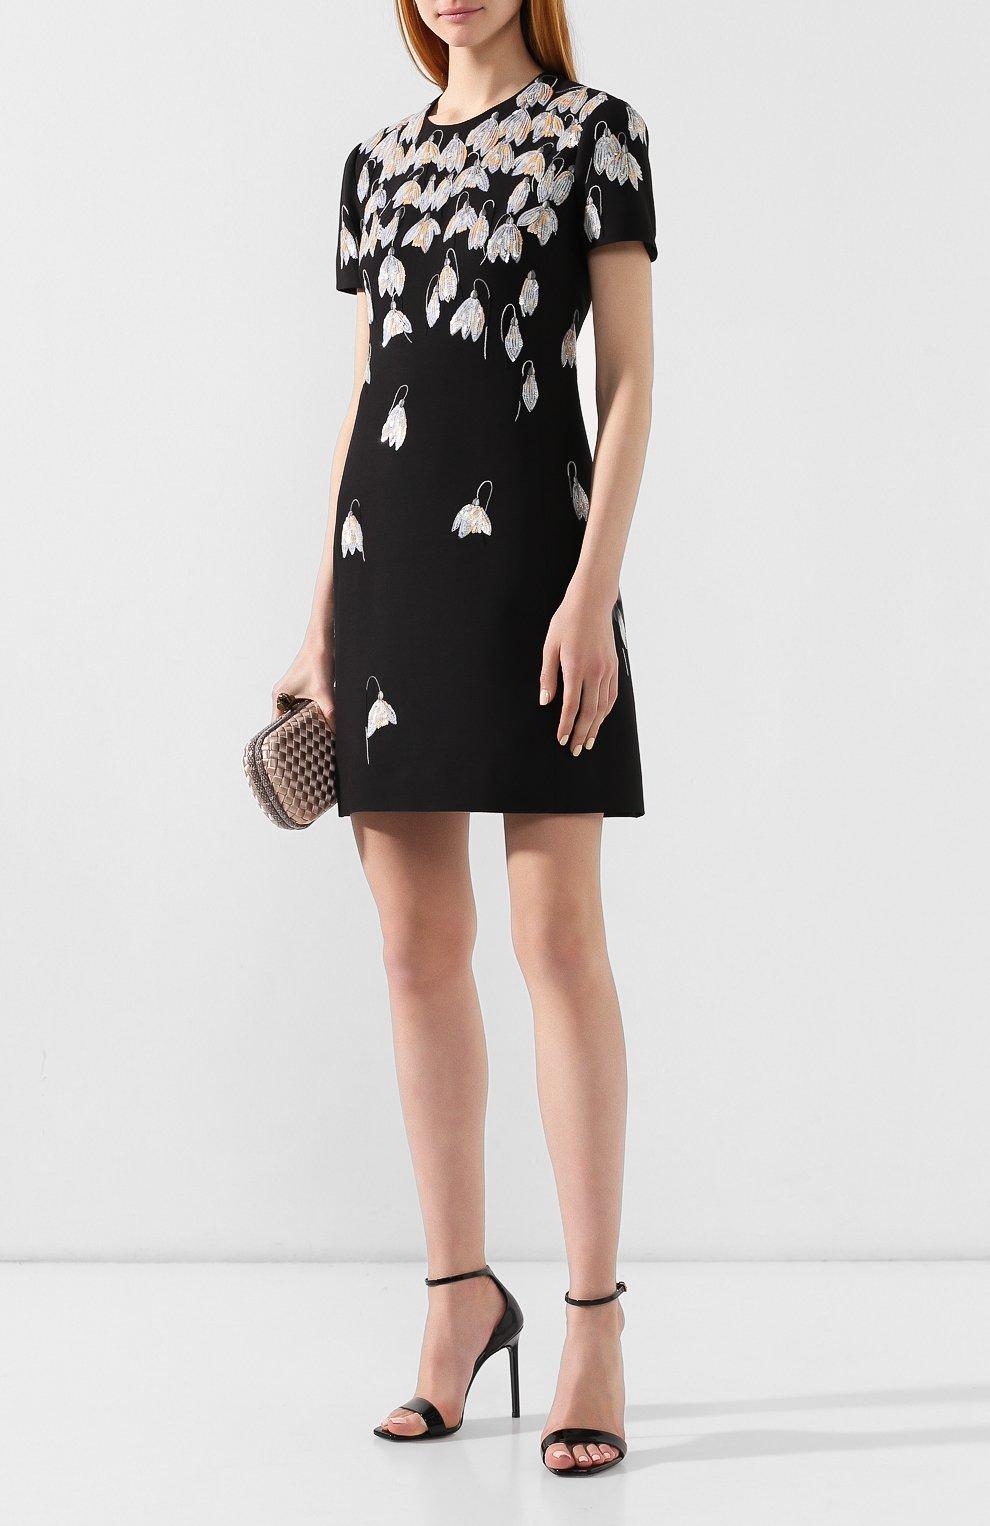 Платье из смеси шерсти и шелка Valentino черное   Фото №2